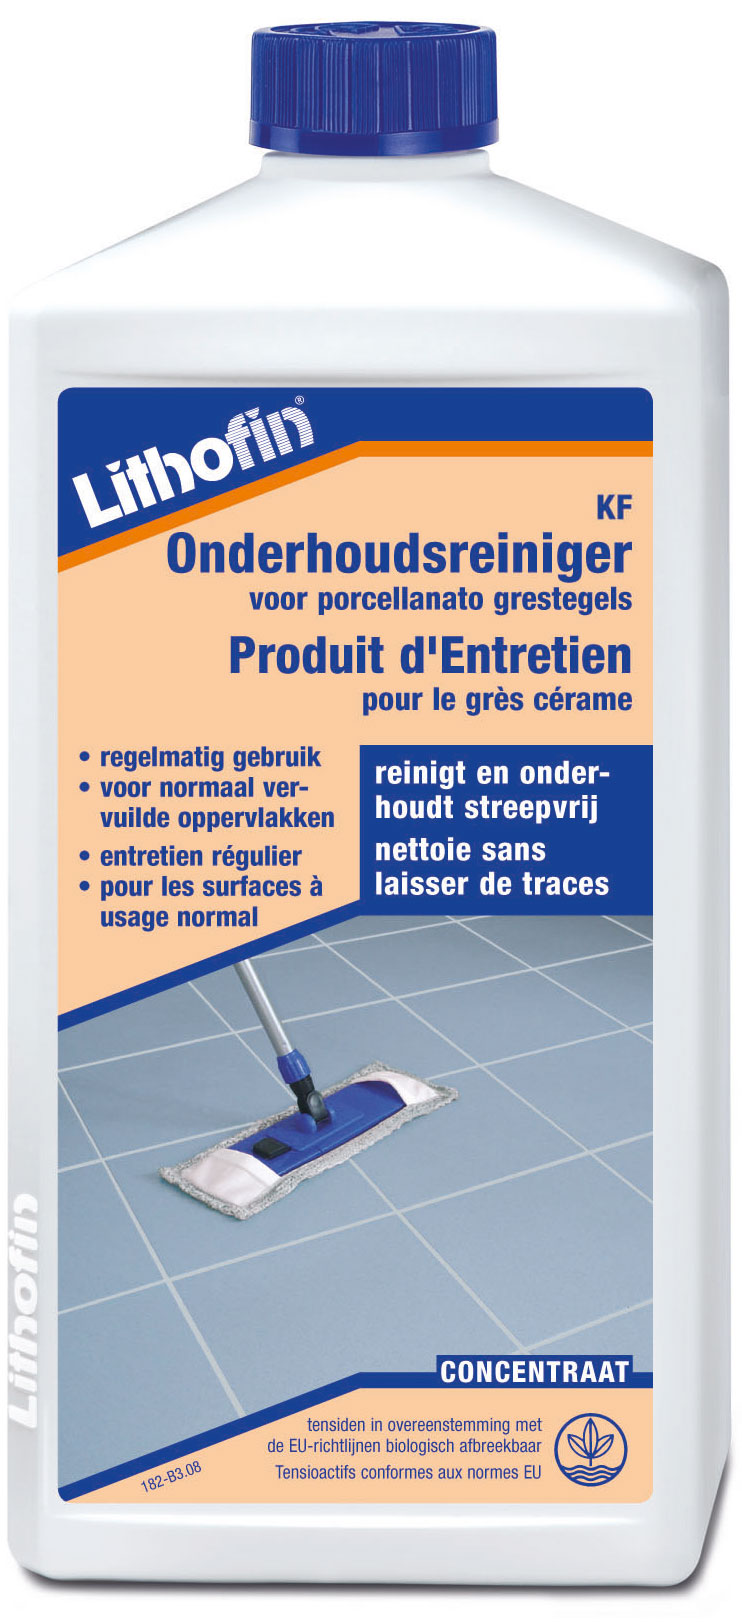 lithofin-kf-onderhoudsreiniger-1mb-jpg